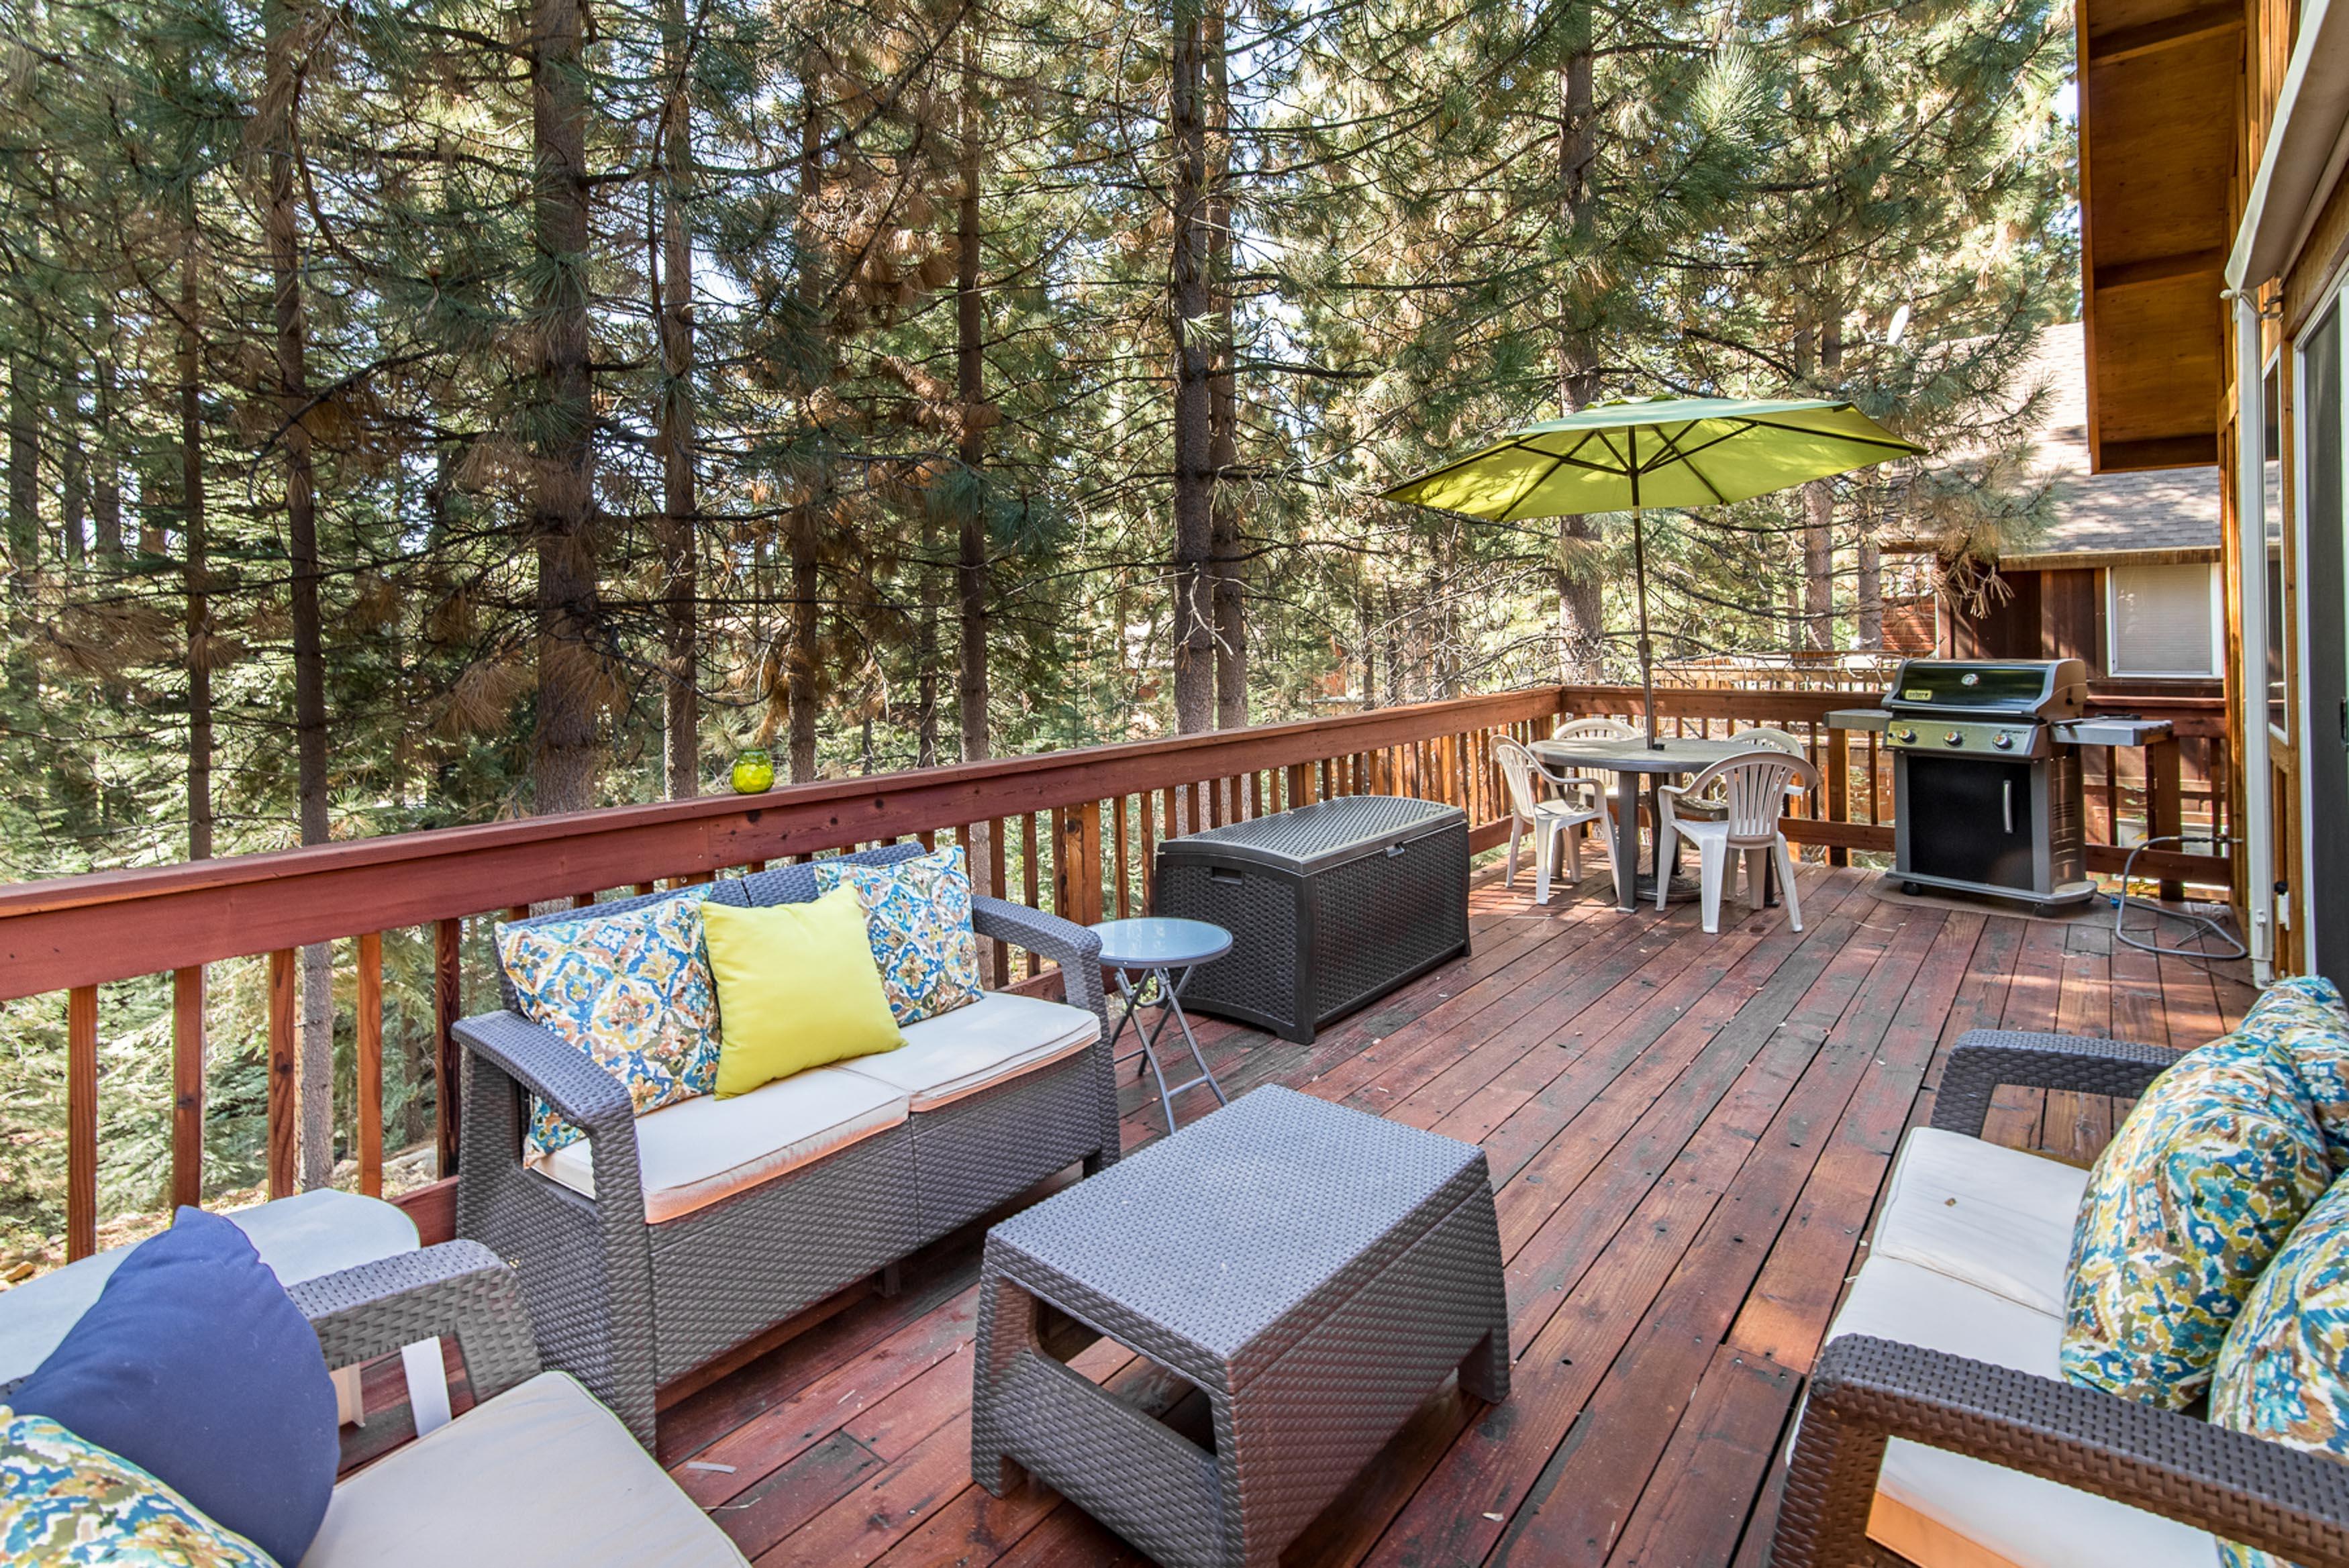 Kings Beach CA Vacation Rental Welcome to Tahoe!